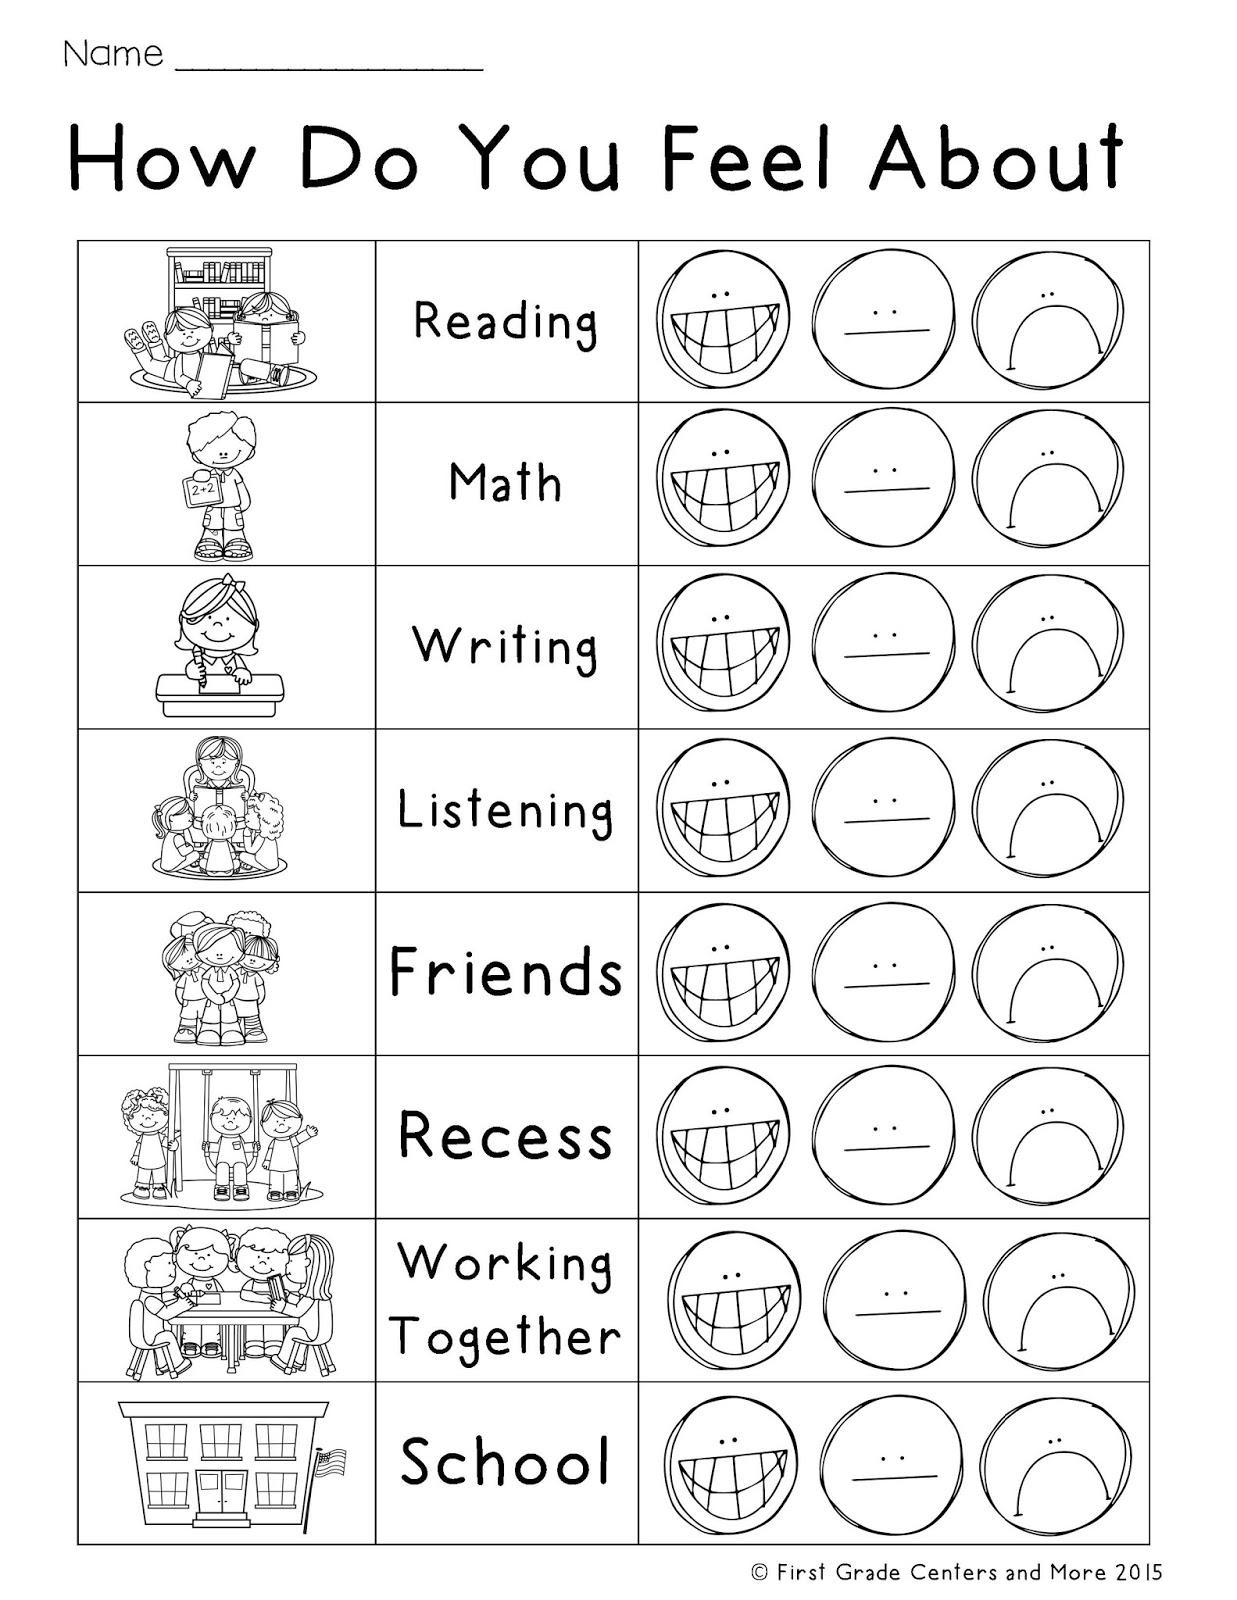 worksheet Sh Worksheets For 1st Grade first grade christmas math worksheets free library christm s july gr de centers nd m e